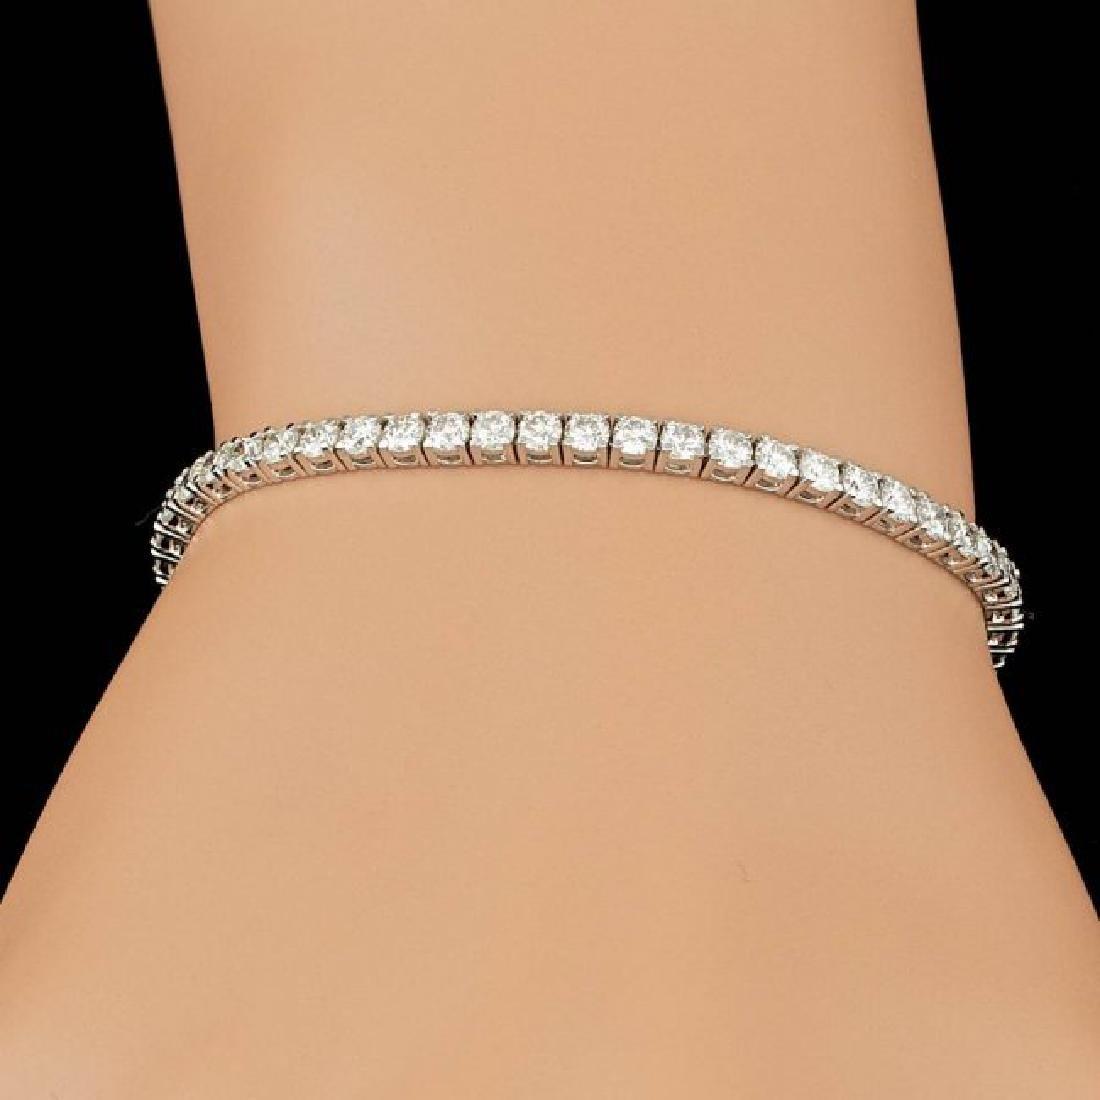 18k White Gold 5.30ct Diamond Bracelet - 4